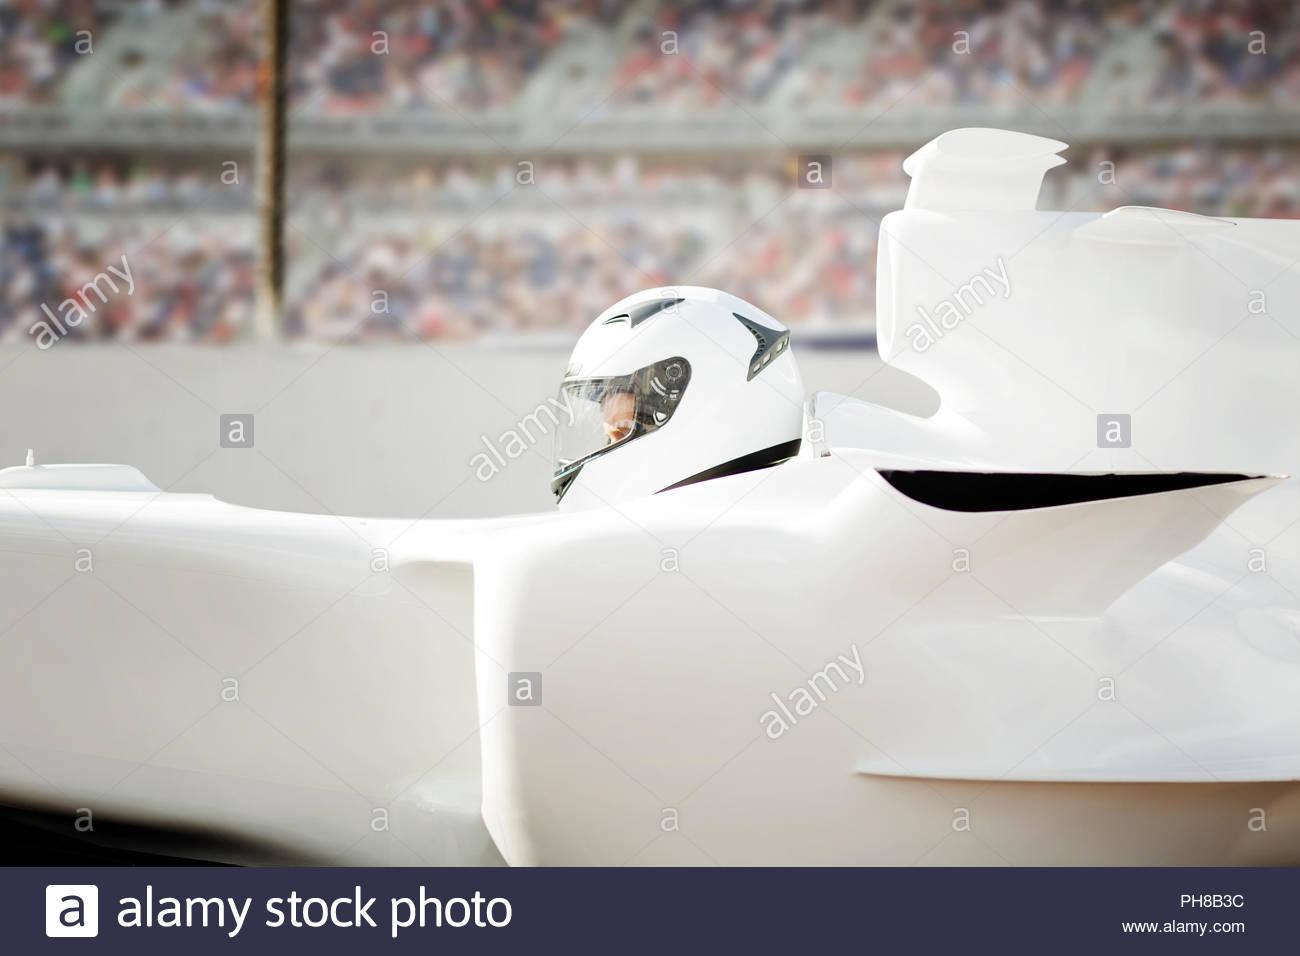 Racing Driver on Track - Stock Image